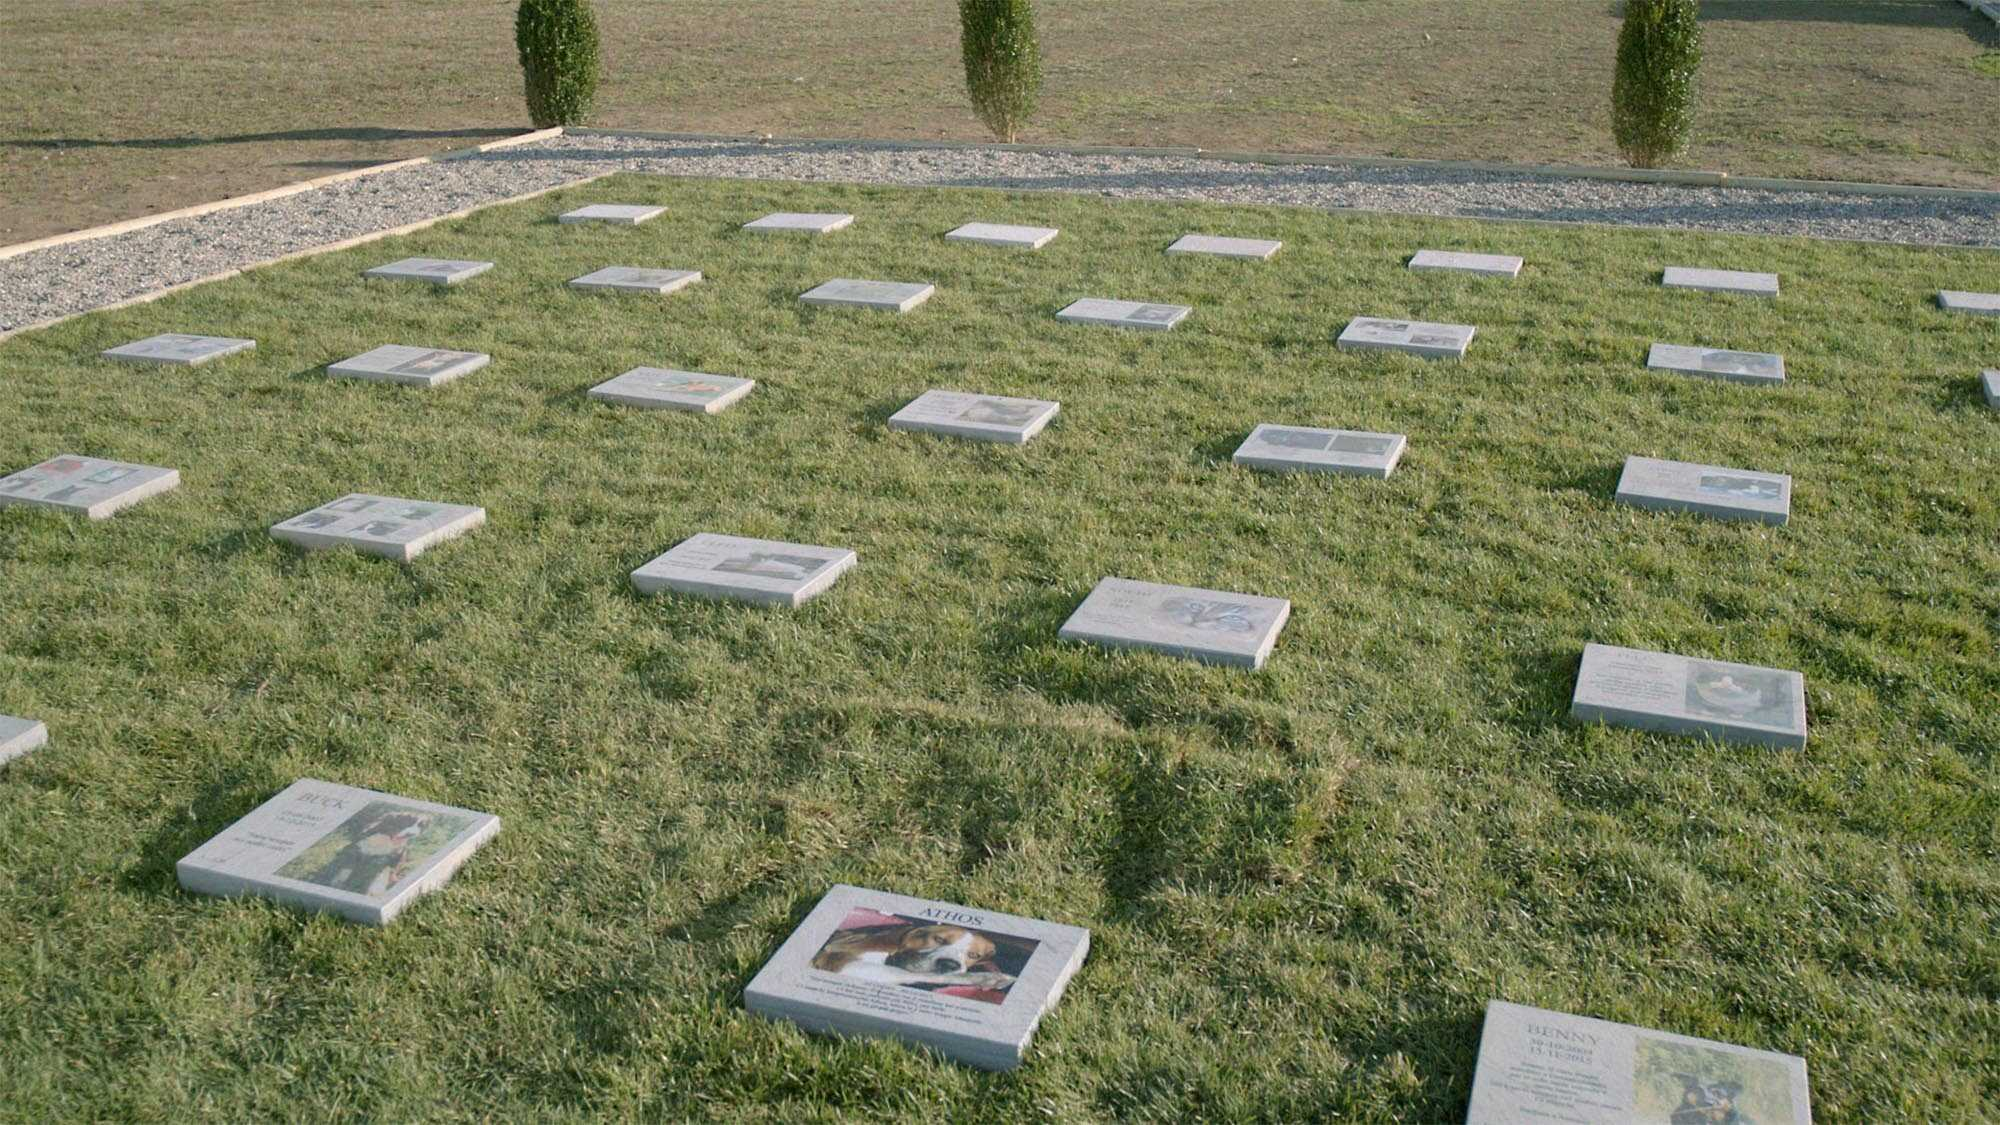 Cimitero per animali - MyPeterPan